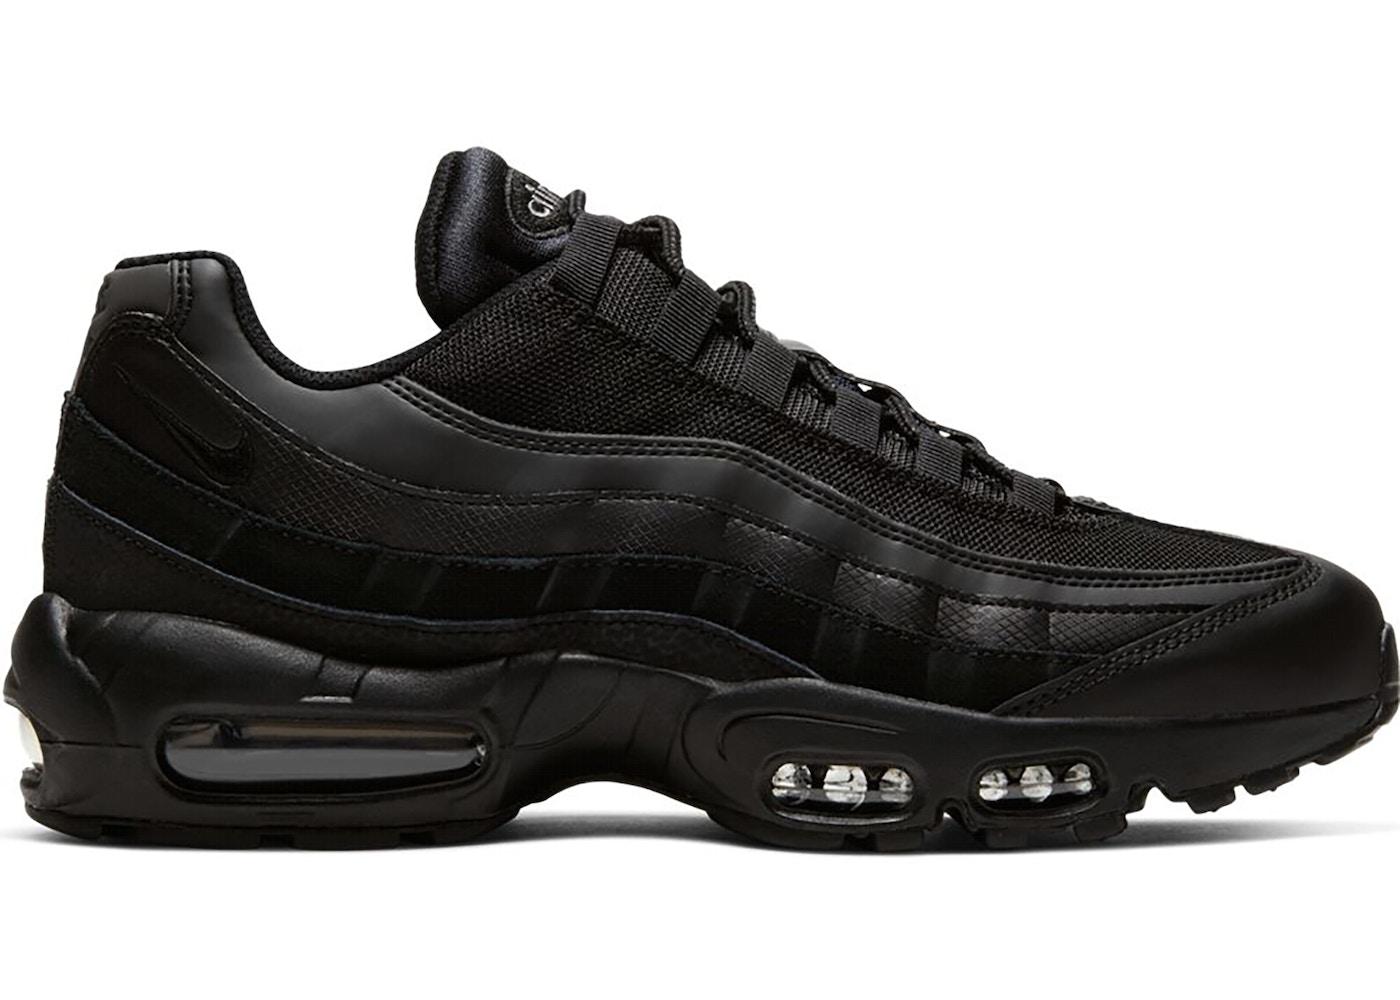 Nike Air Max 95 Triple Black (2020)